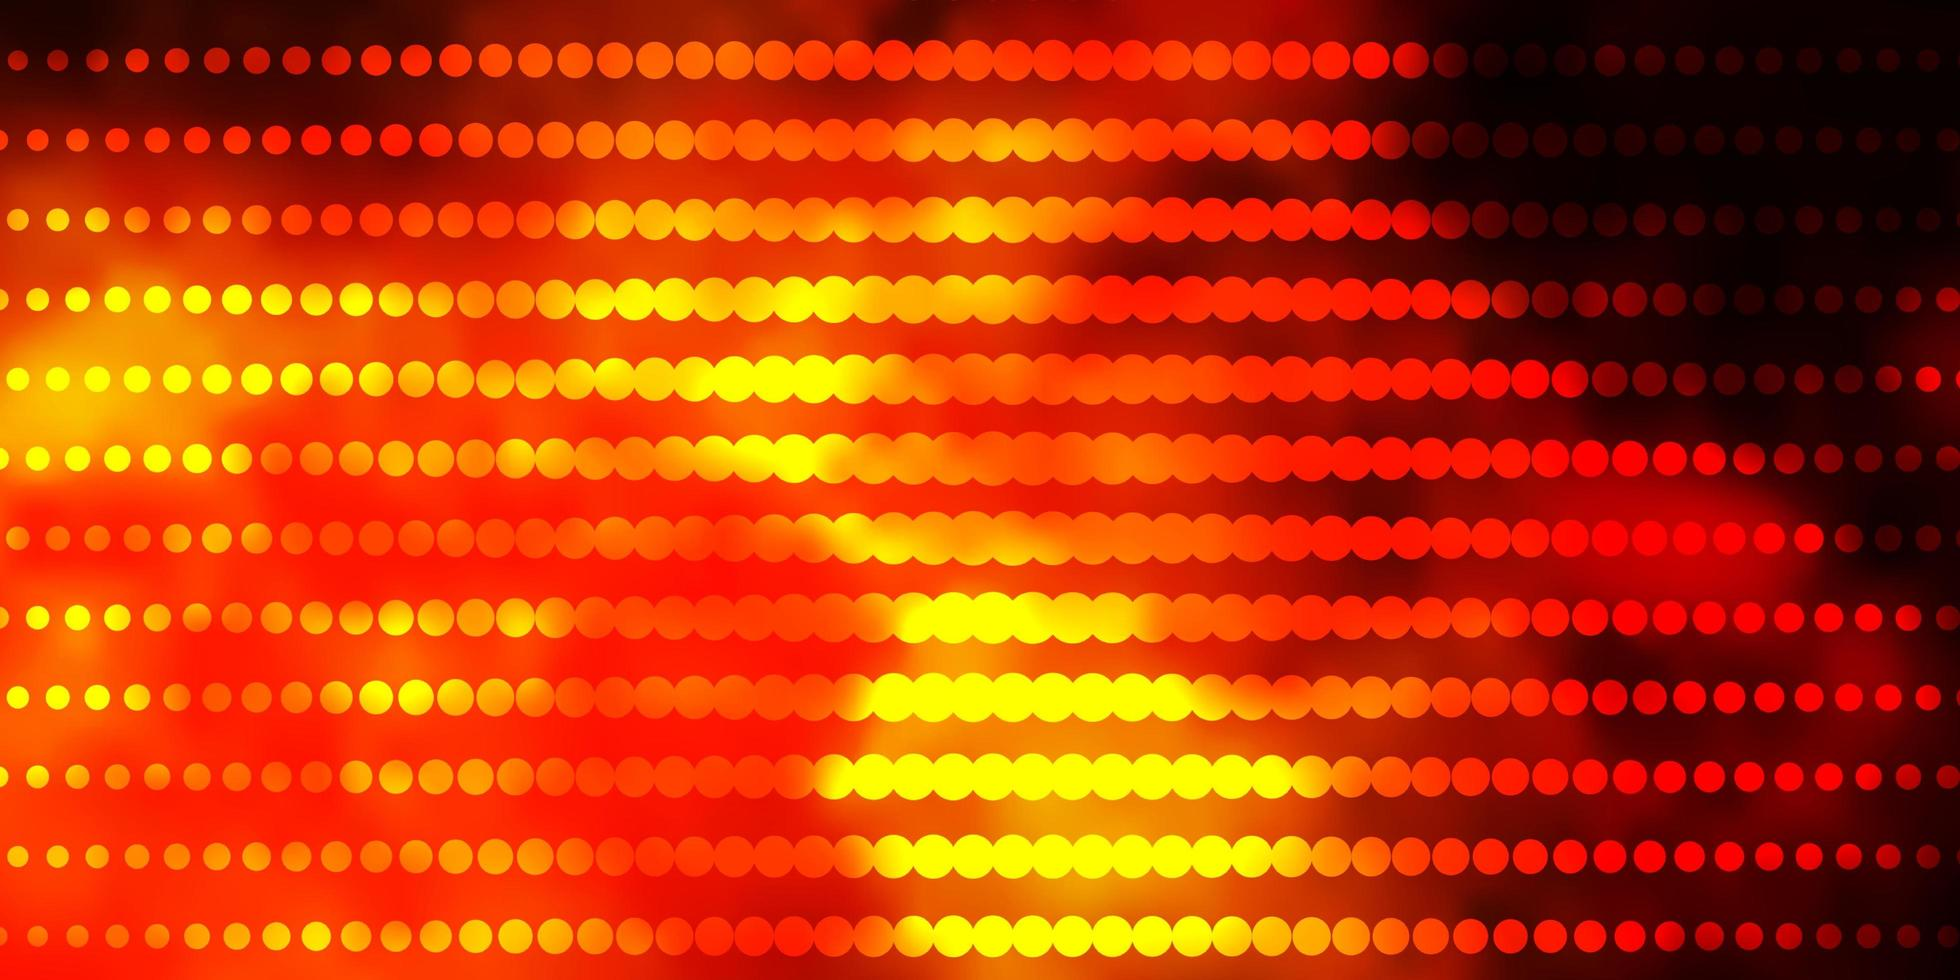 Telón de fondo de vector naranja oscuro con círculos.